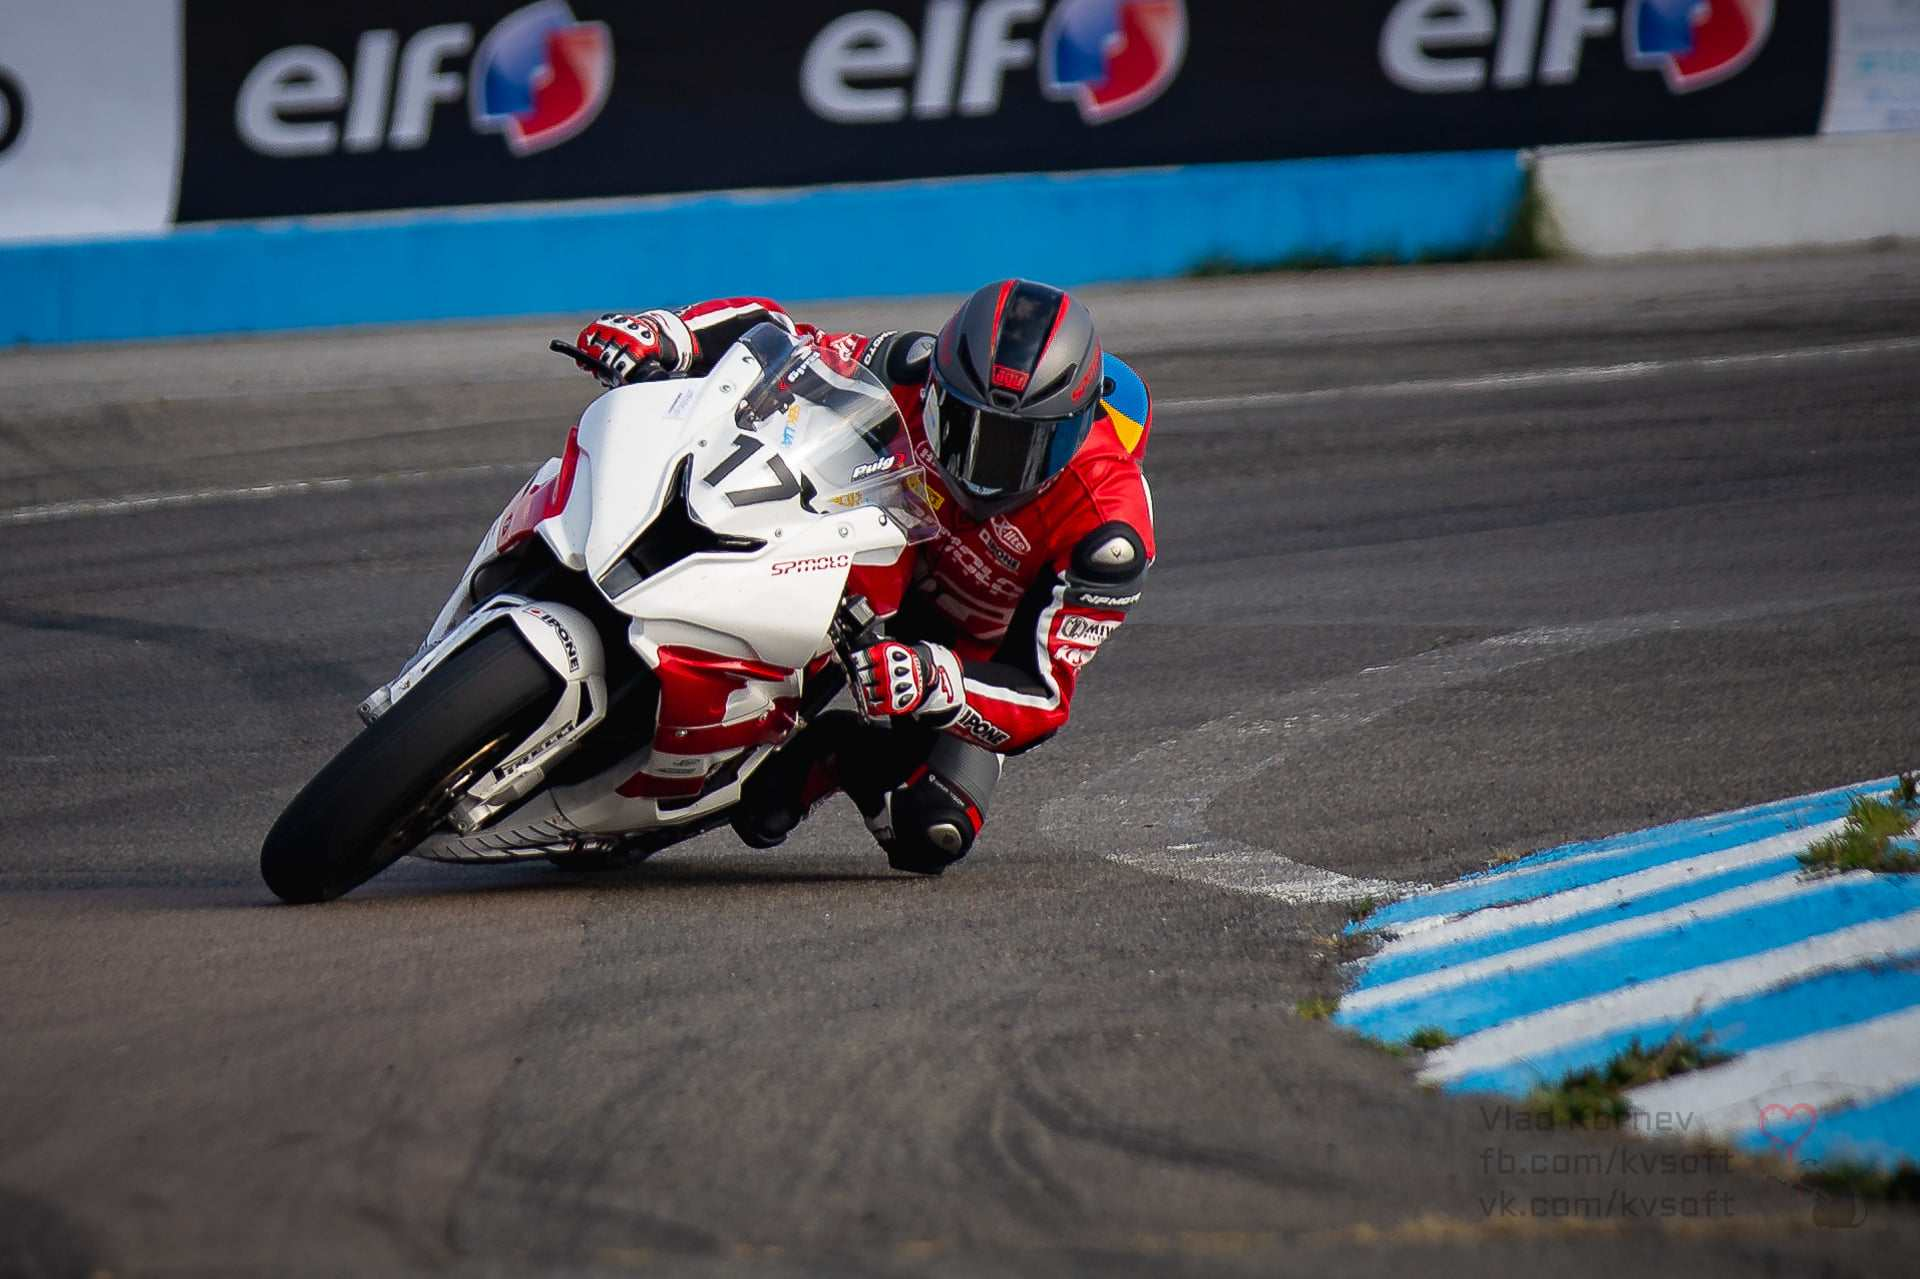 5-6_etap_MotoGPUkraine_021